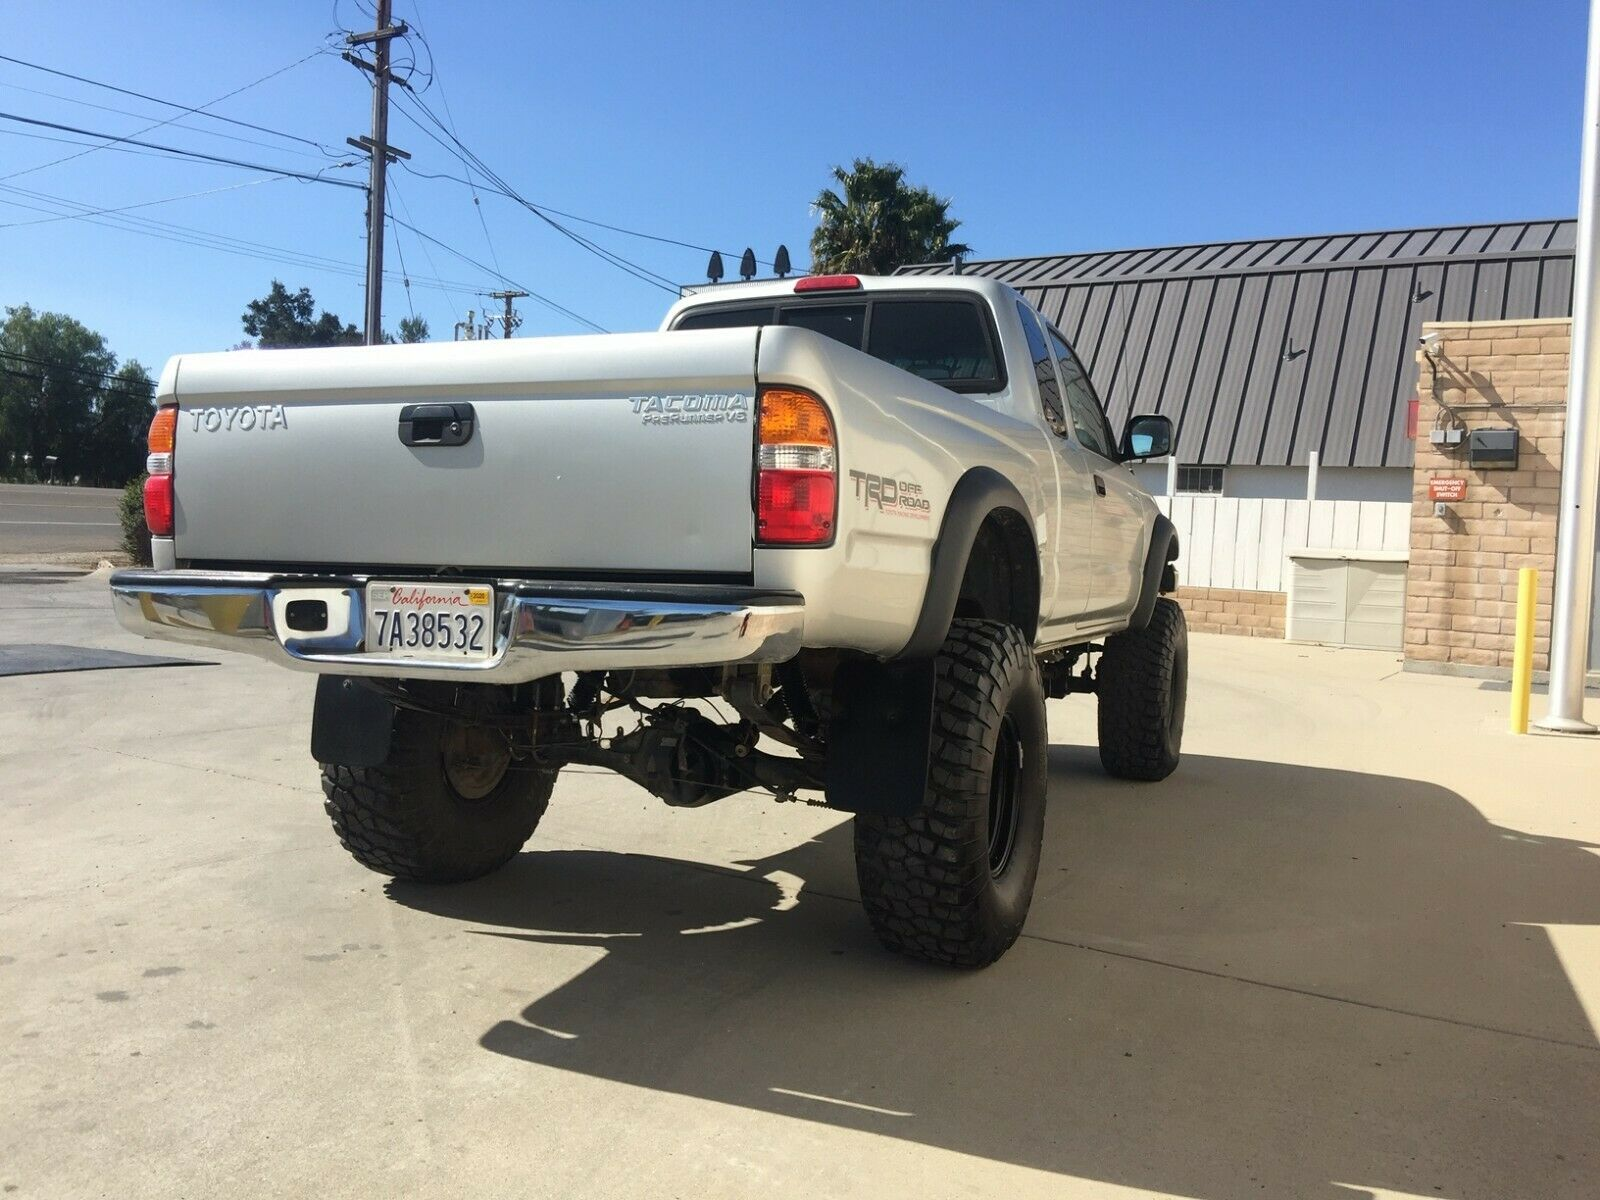 converted 2003 Toyota Tacoma lifted